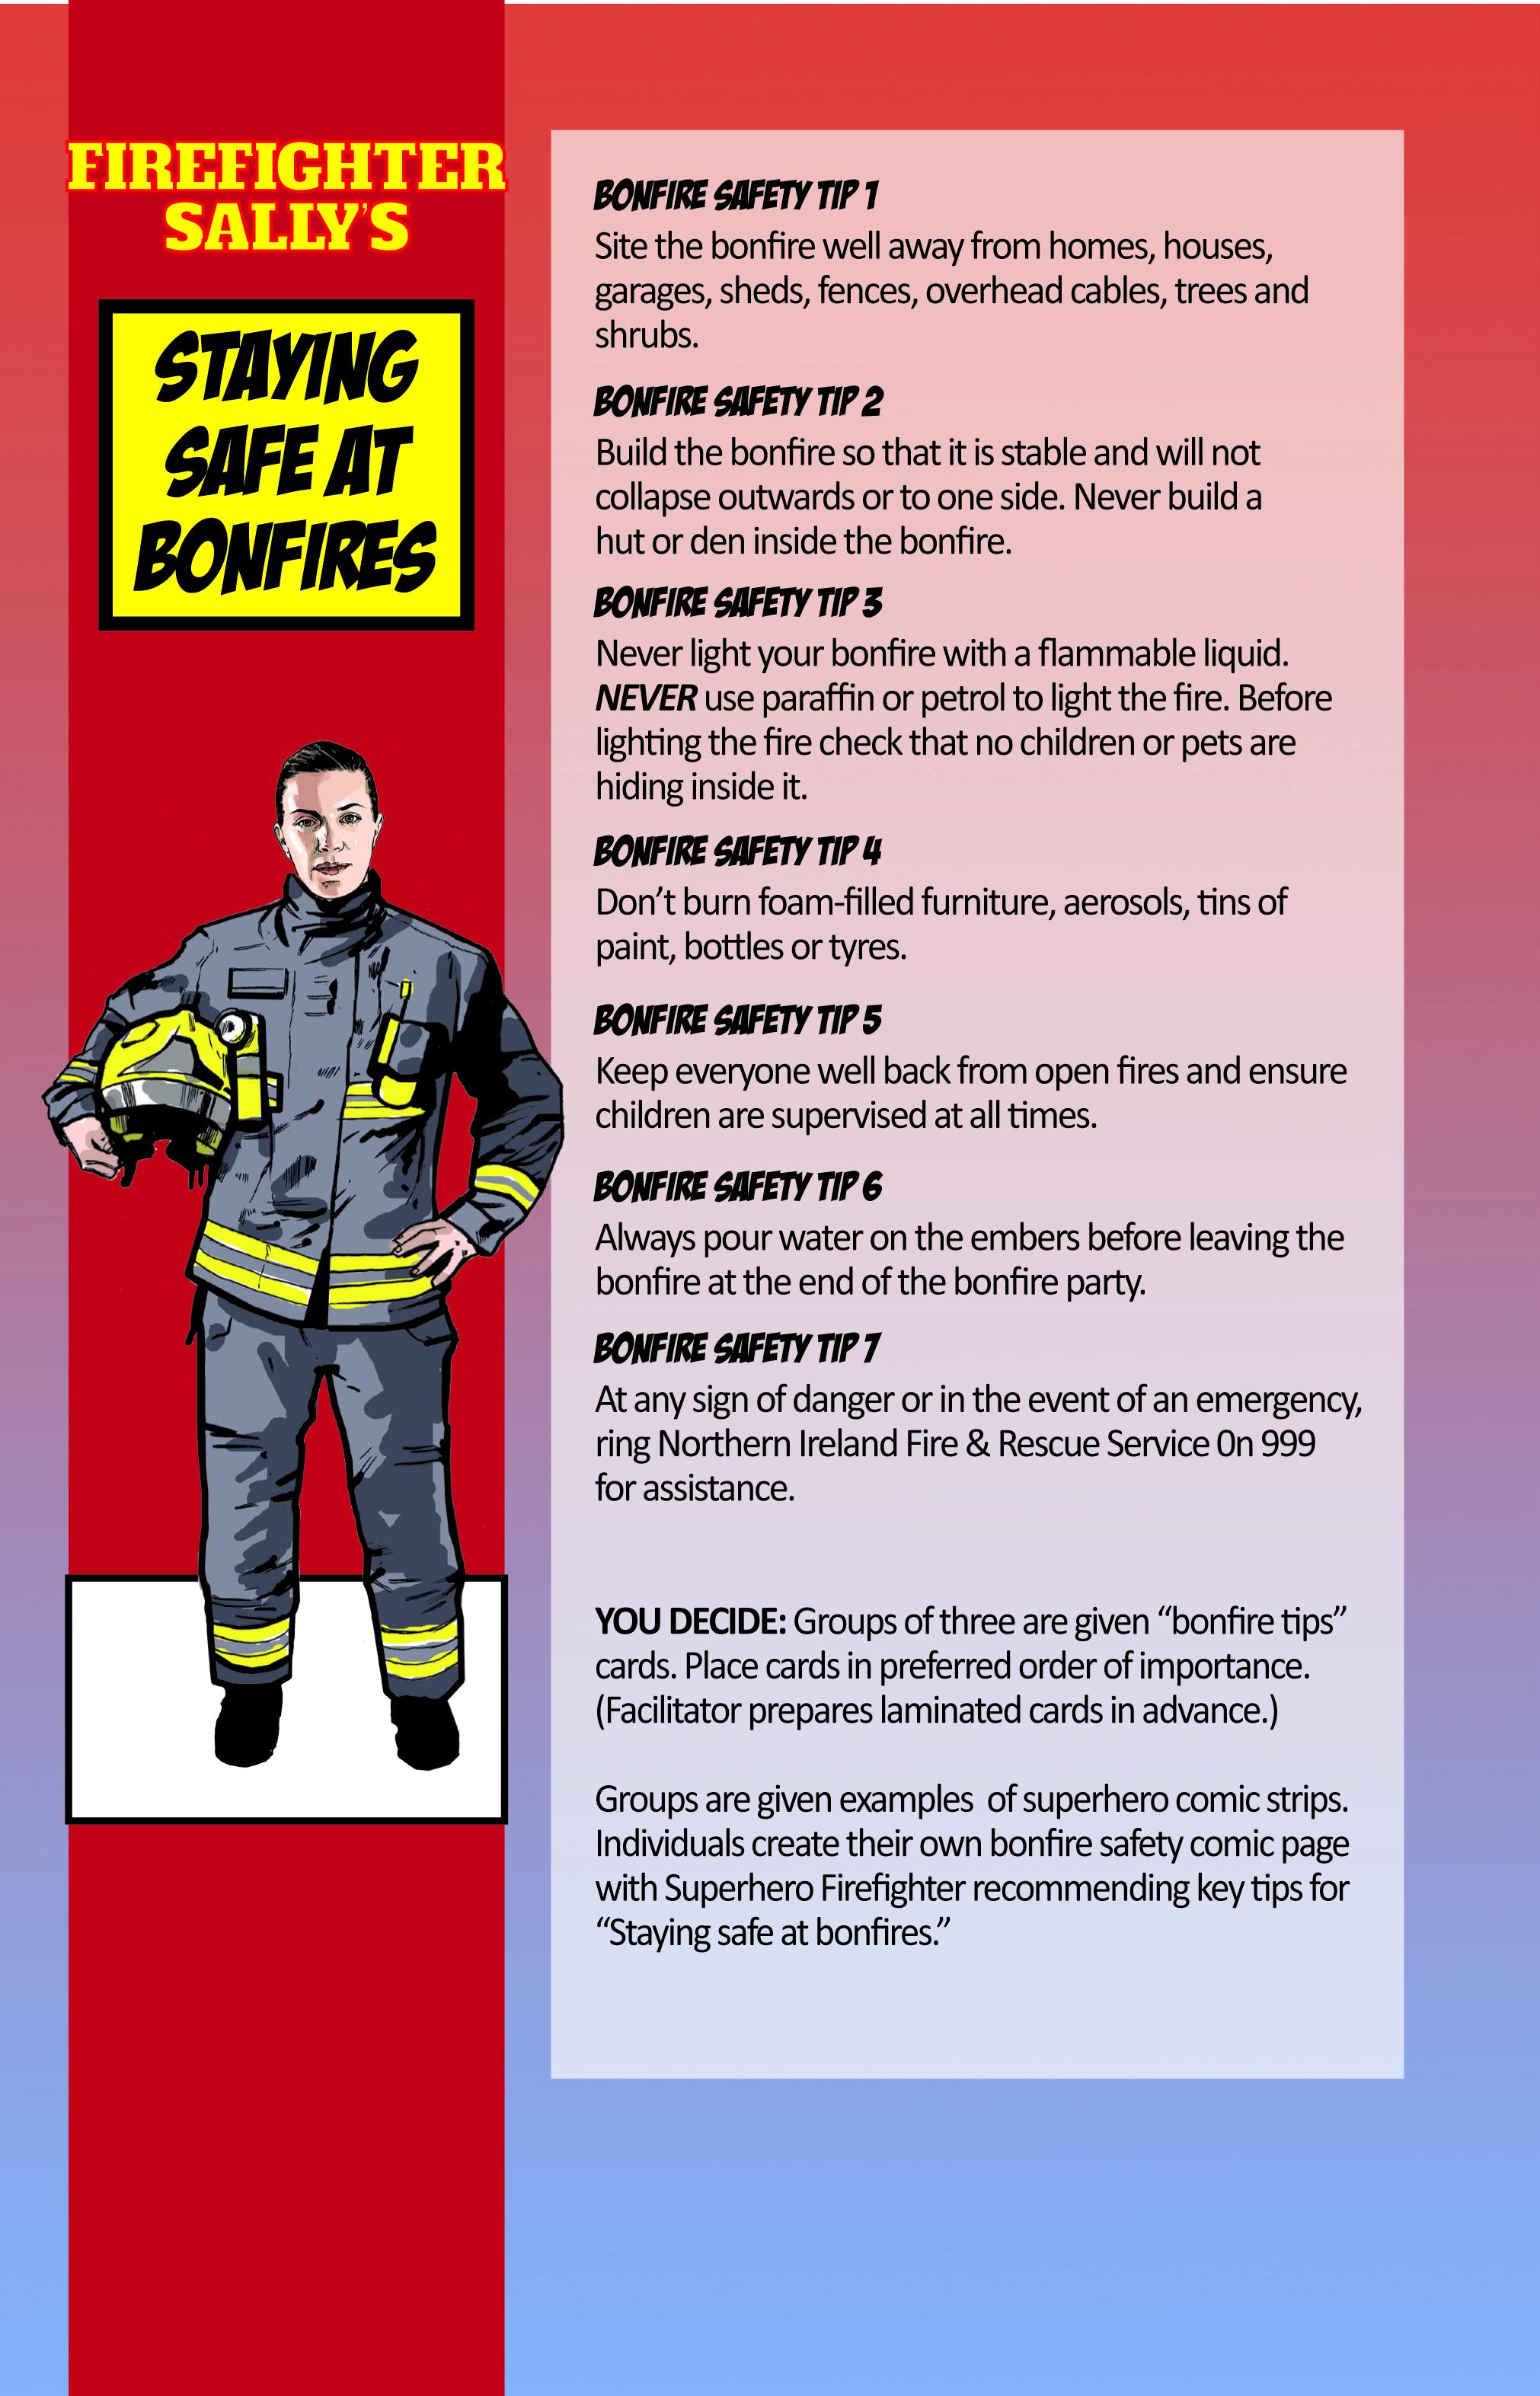 BURNING PAGE 17